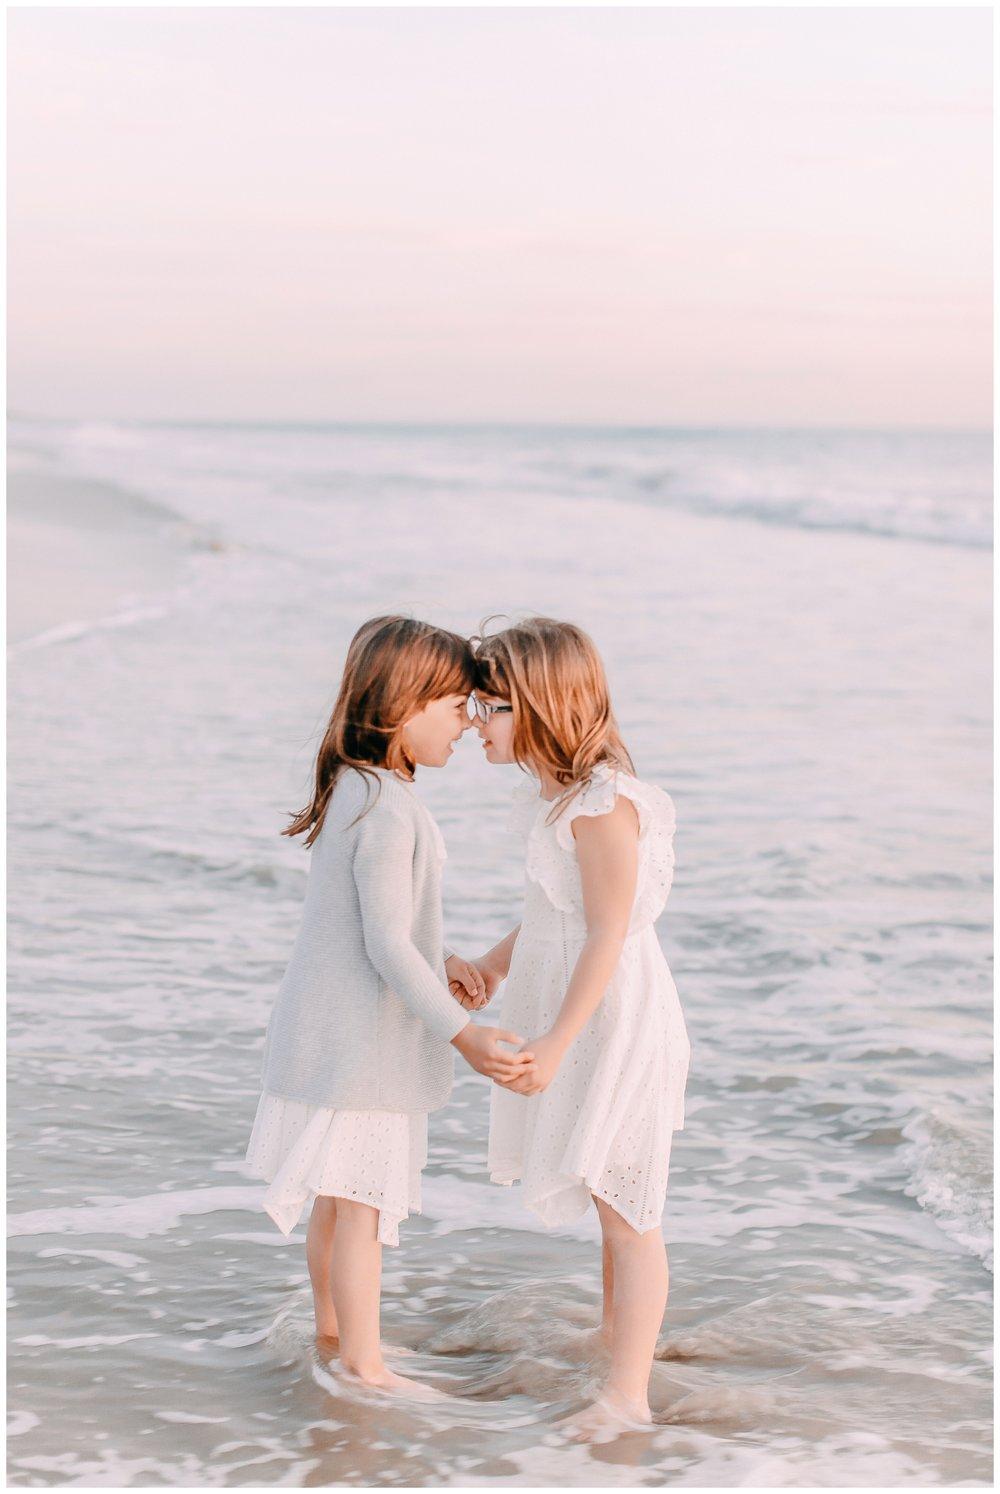 San_clemente_family_session_Orange_county_family_photographer_cori_kleckner_photography_laguna_beach_family_session_0715.jpg